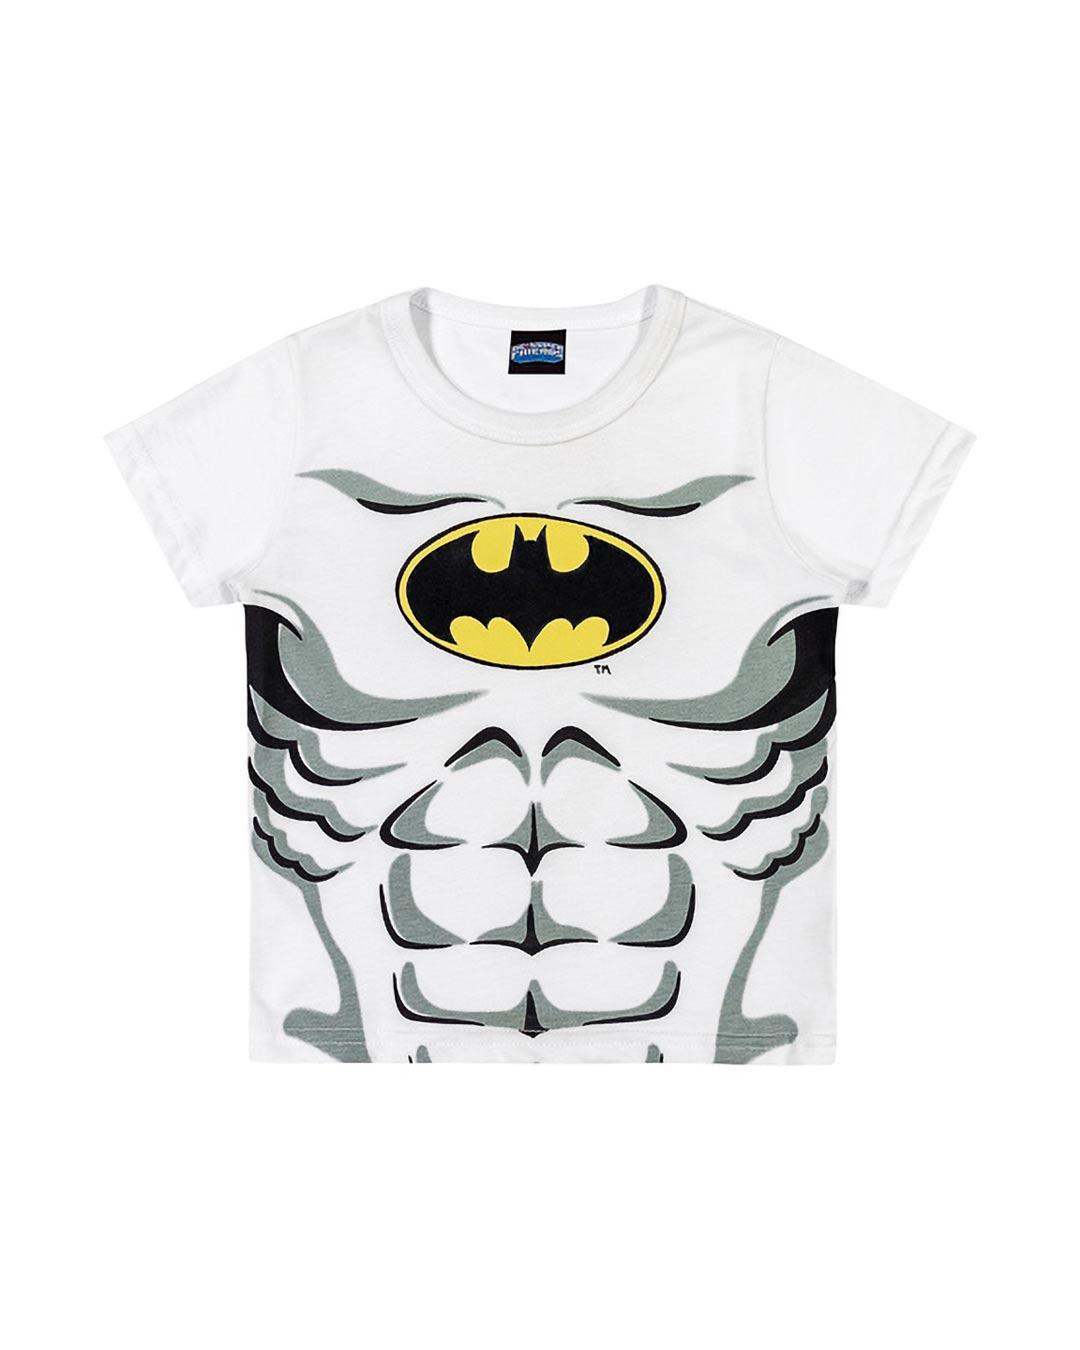 Camiseta Infantil Hero Batman Branco - DC Super Friends